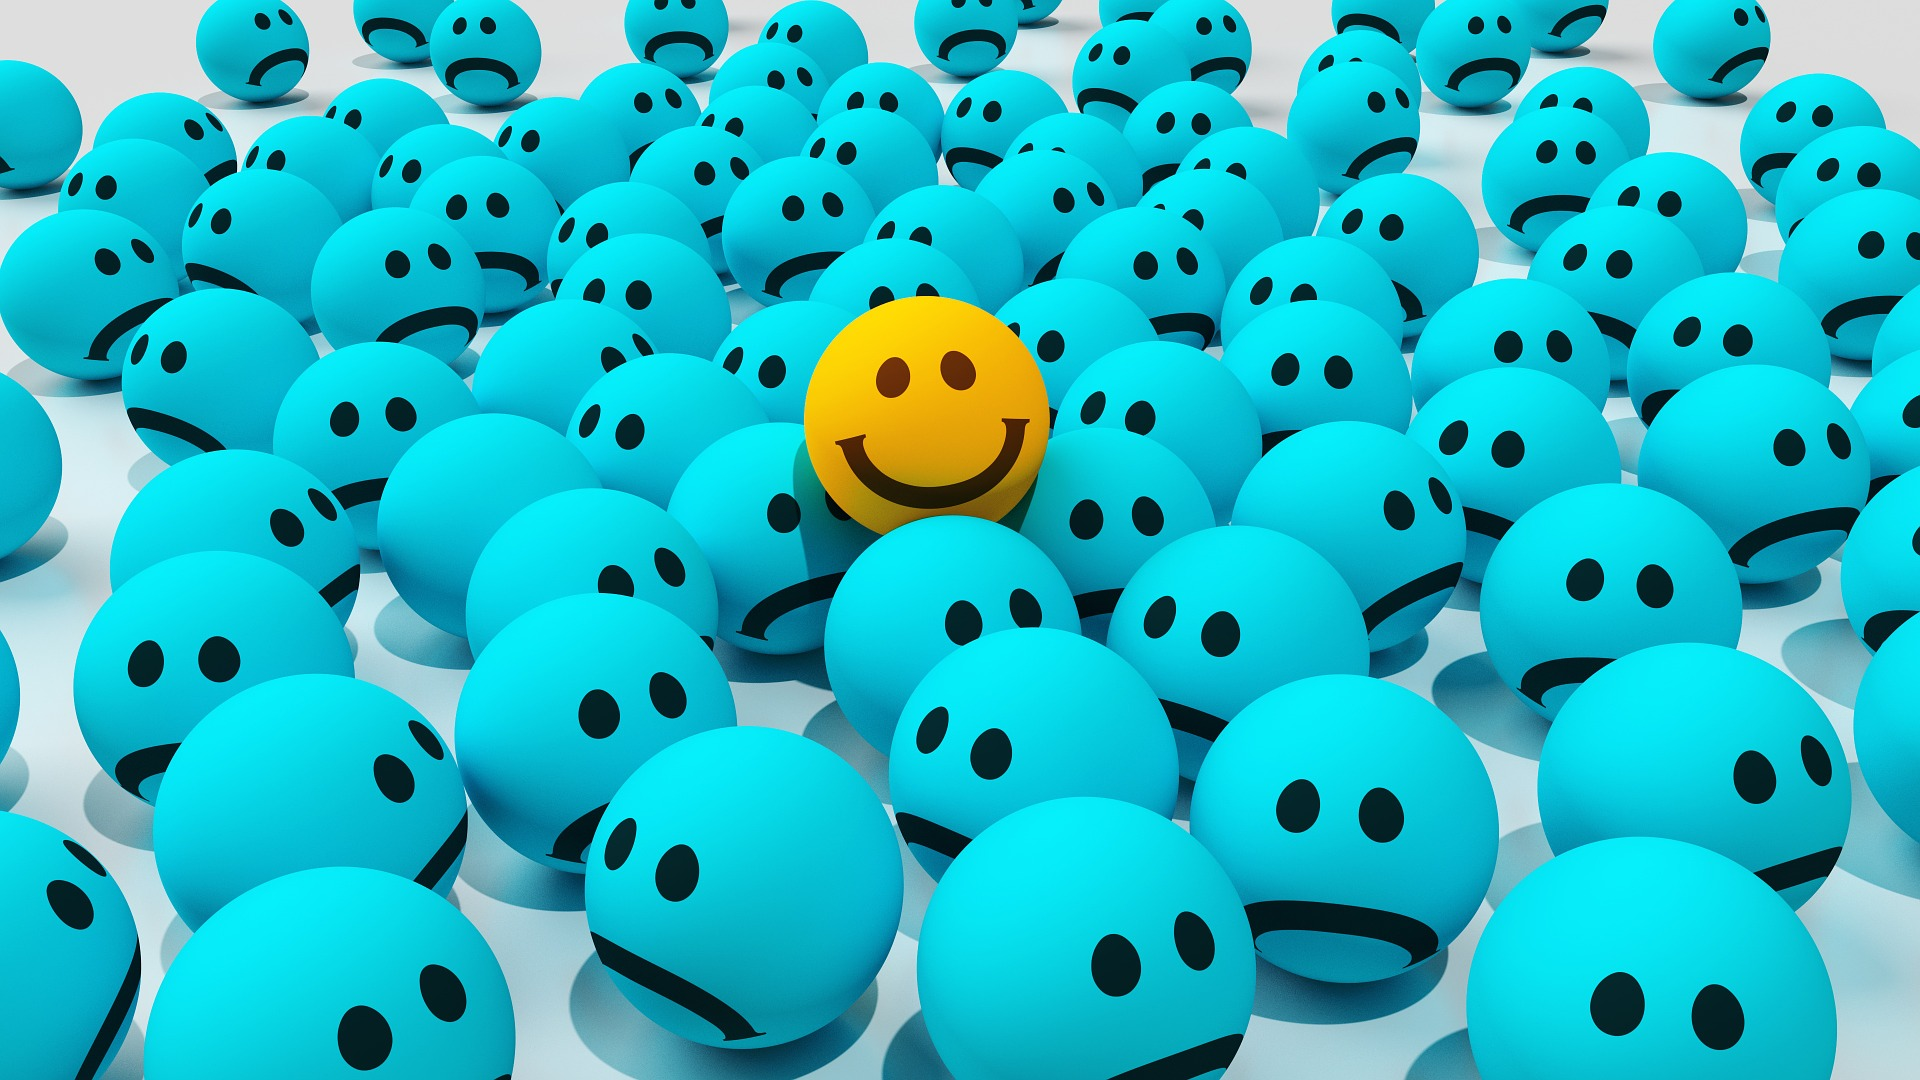 10 Ways to Improve Your Emotional Quotient